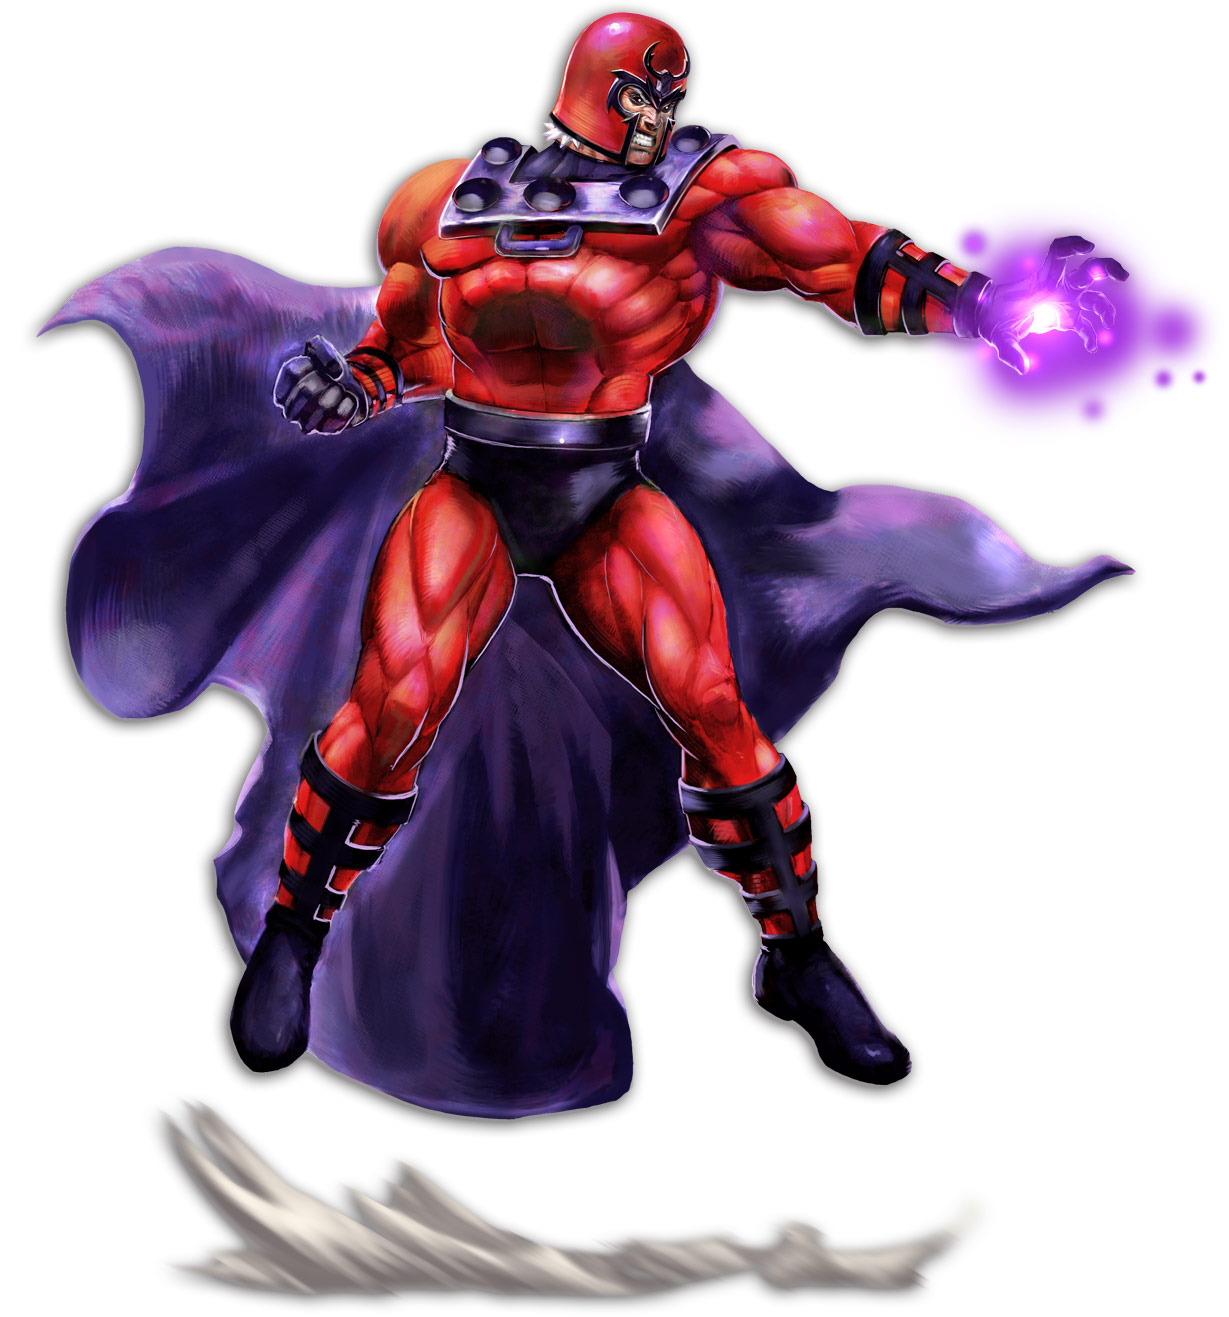 Magneto artwork, Marvel vs. Capcom 2